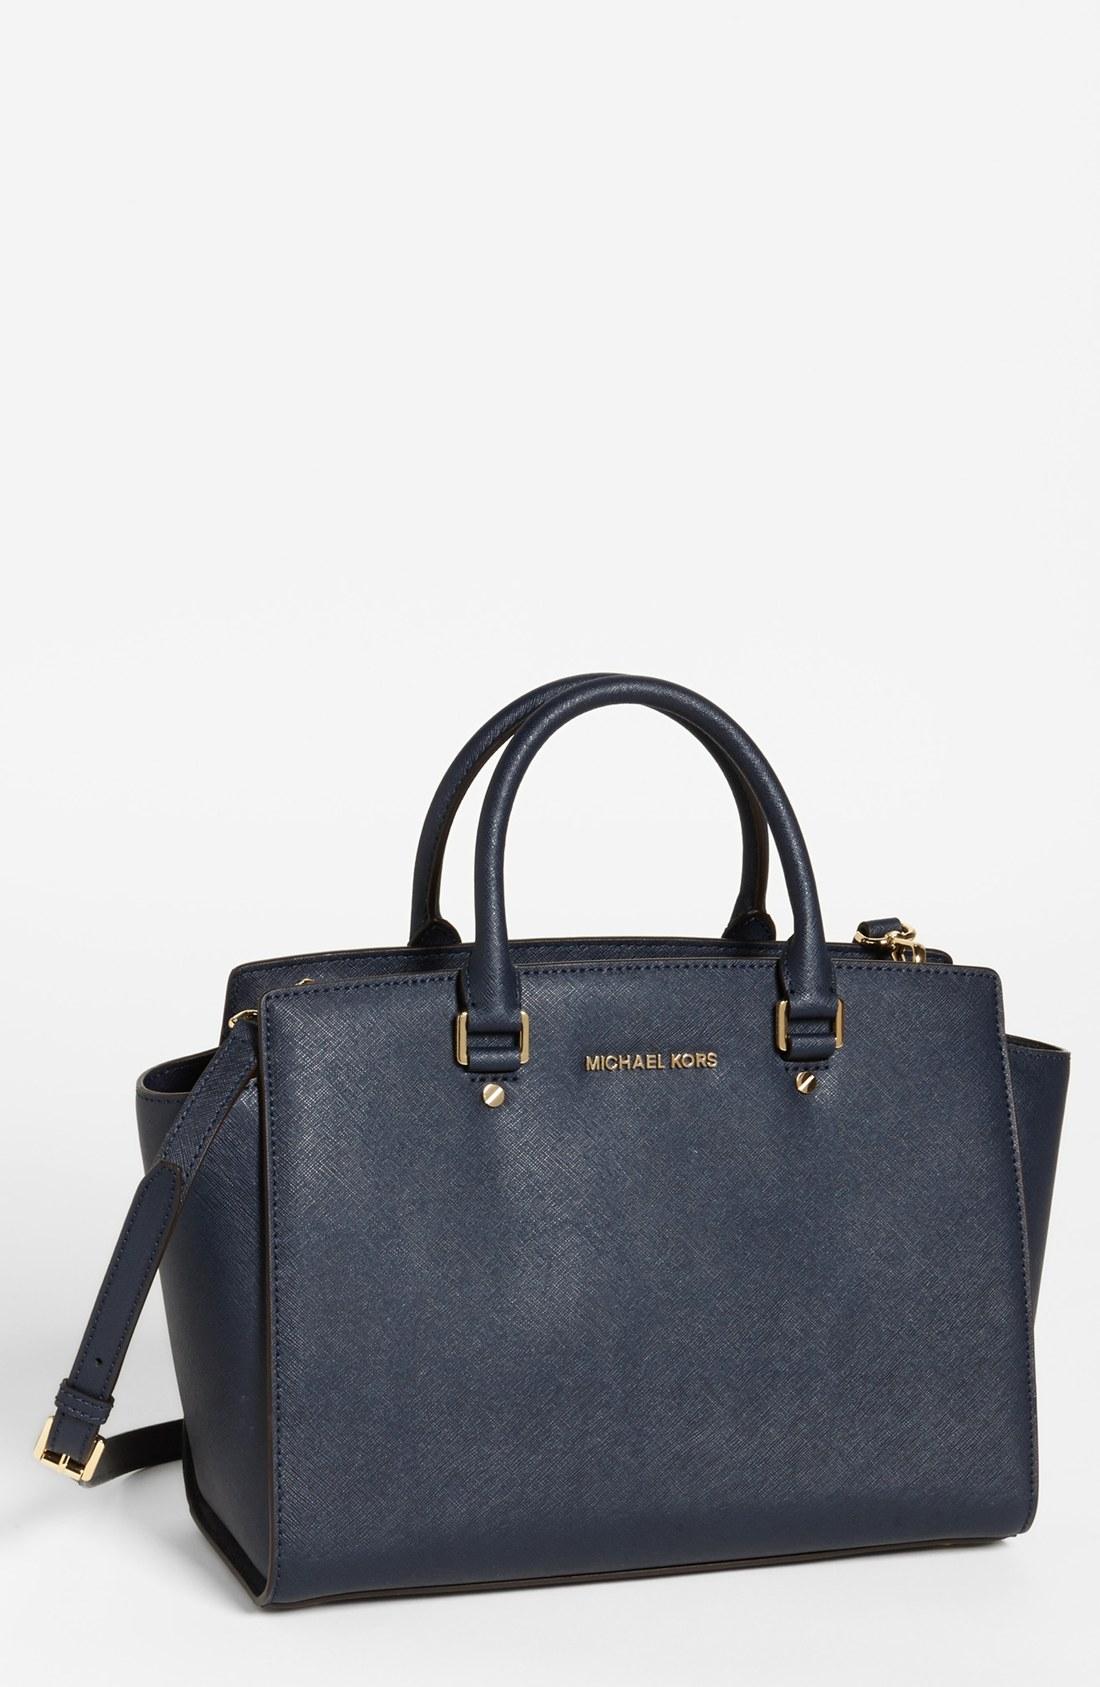 michael michael kors 39 large selma 39 zip top satchel in blue navy lyst. Black Bedroom Furniture Sets. Home Design Ideas